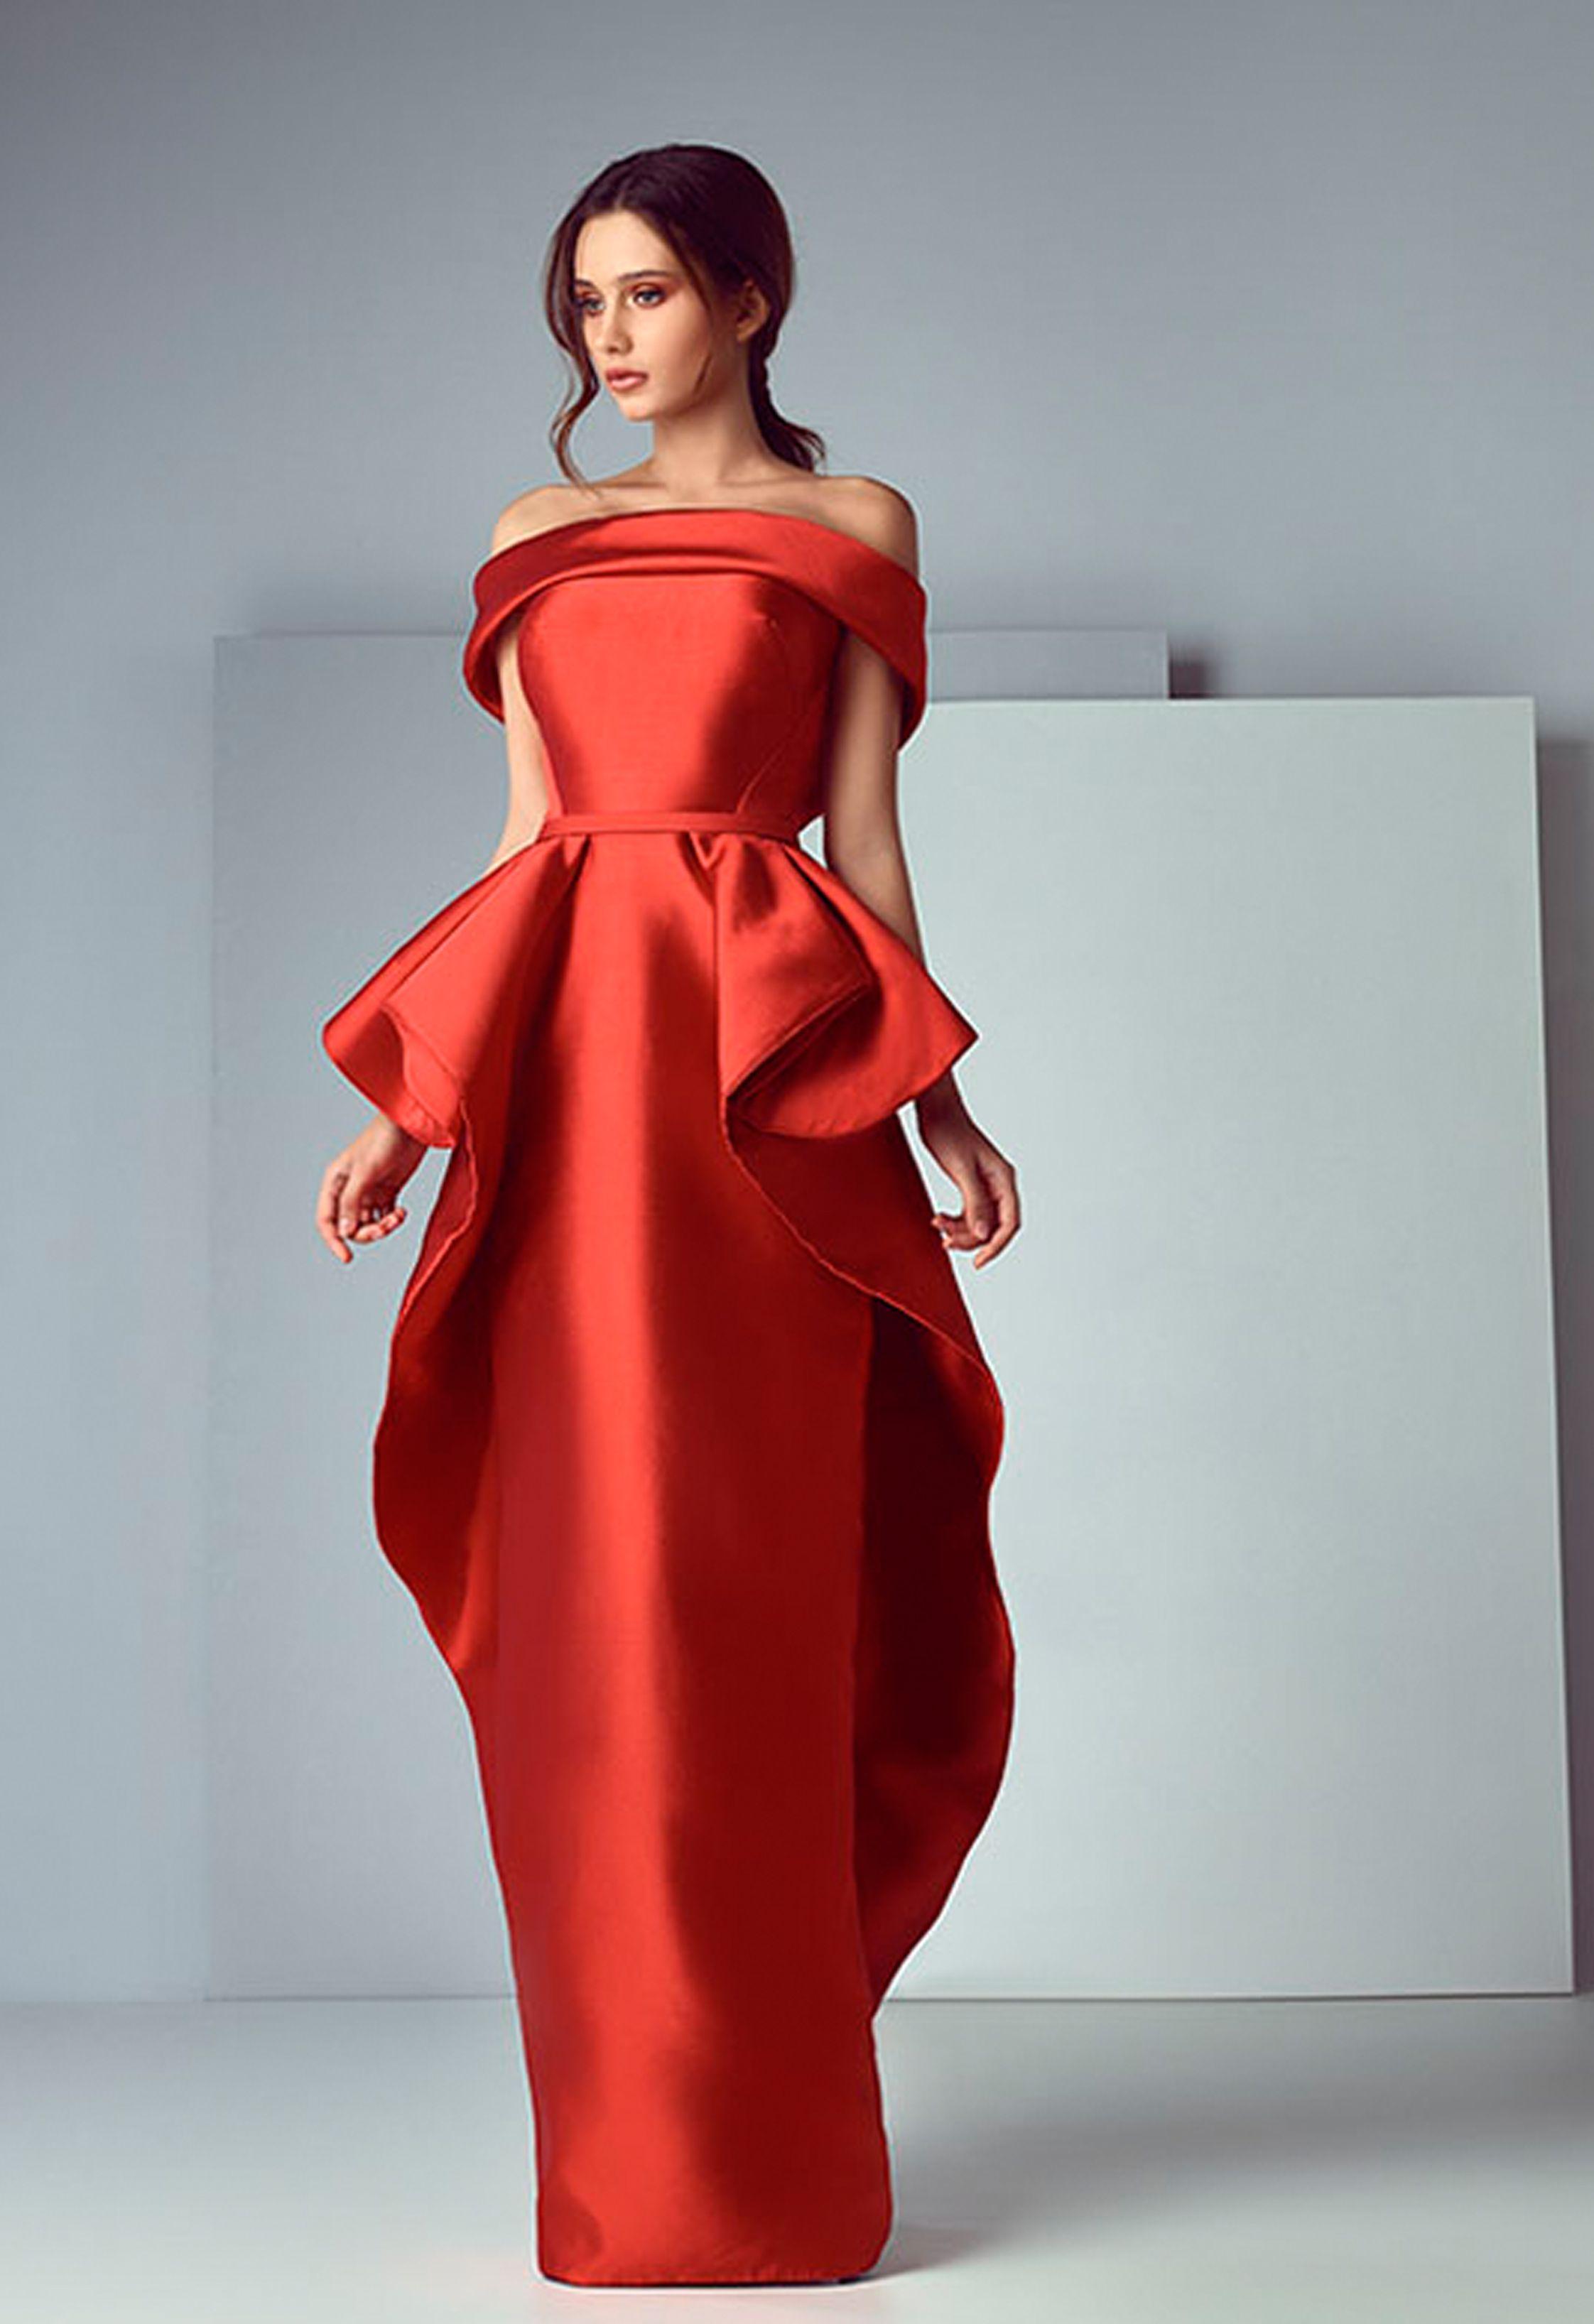 Fantastic Vestidos Novia Rojos Model - Wedding Dress Ideas ...